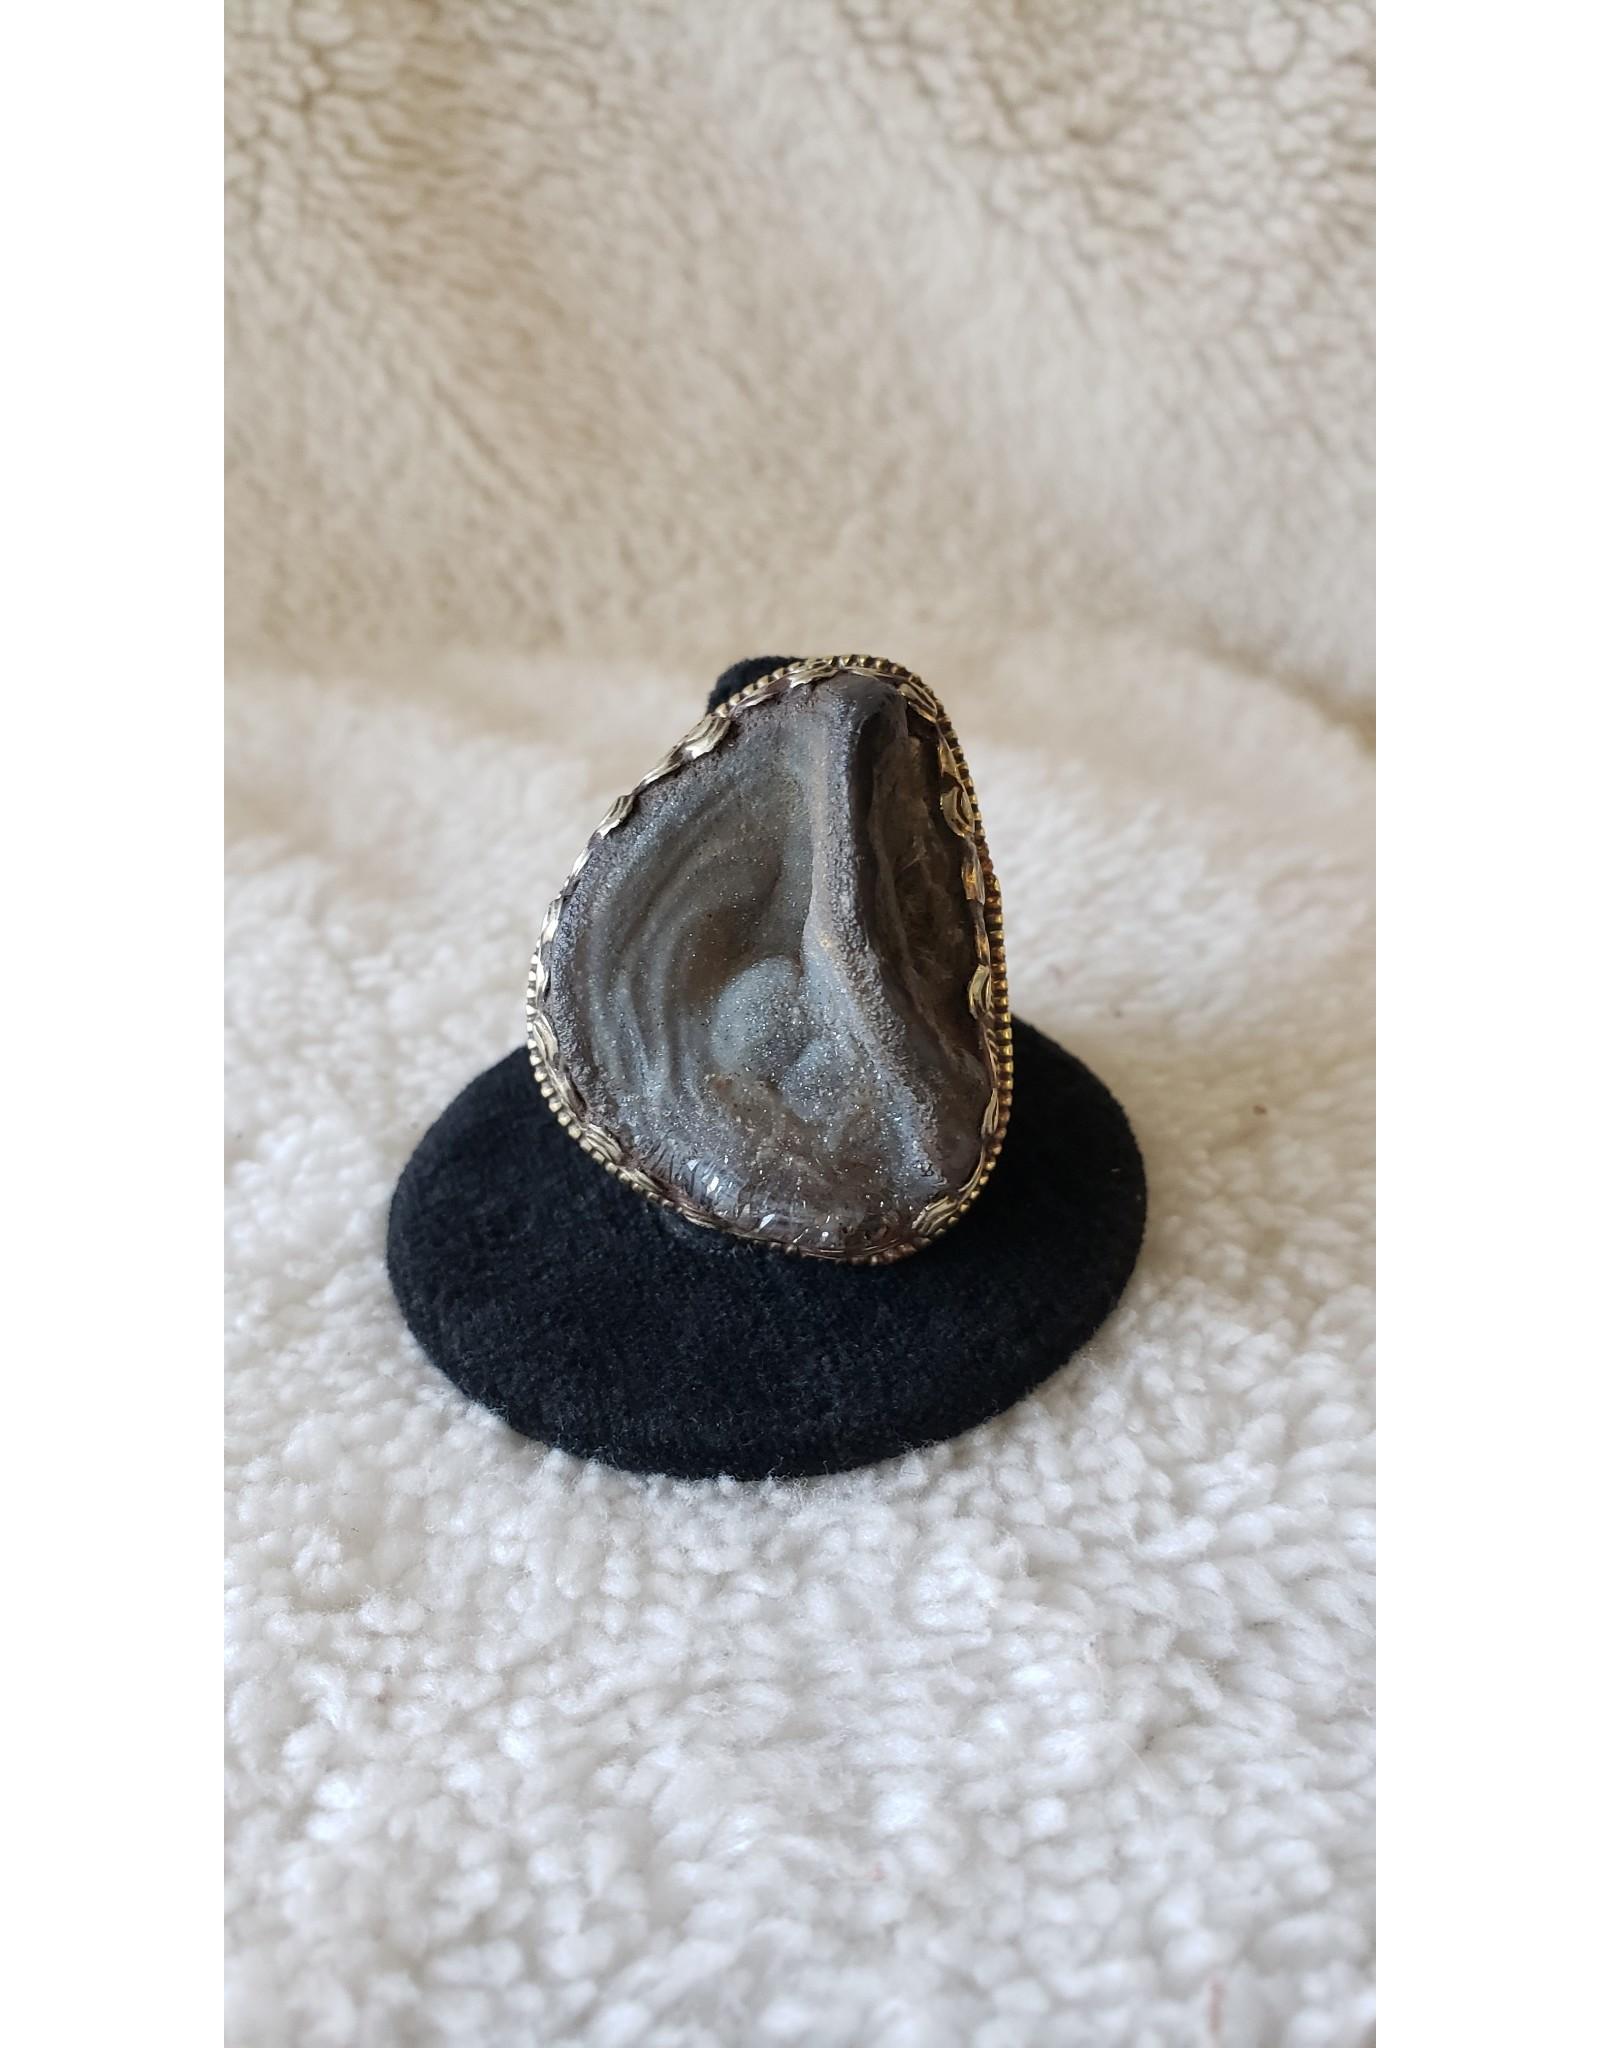 Druzy Agate Ring | Adjustable